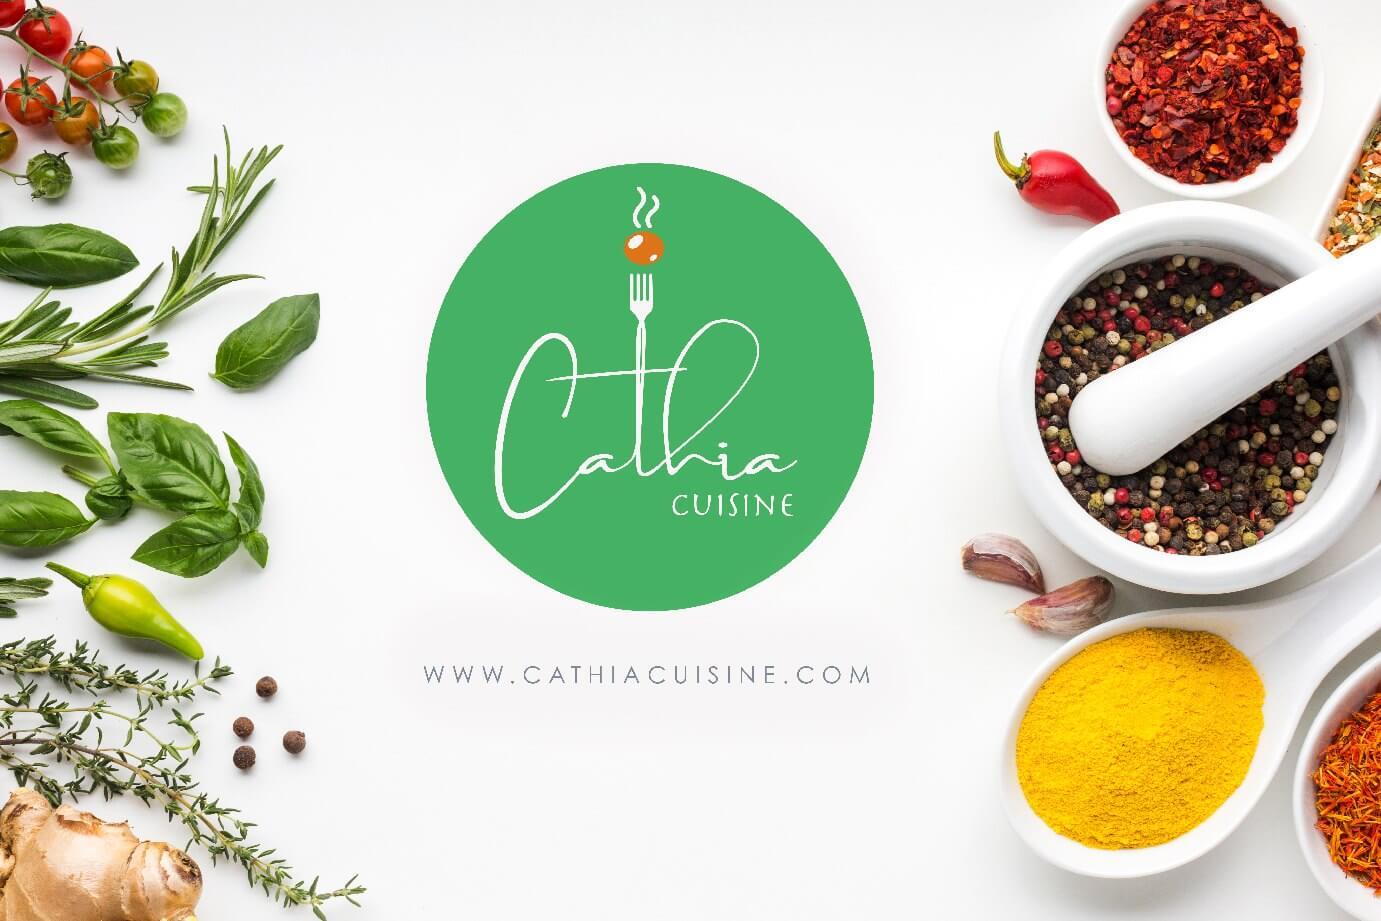 Cathia Cusine Logo by SAJID SULAIMAN